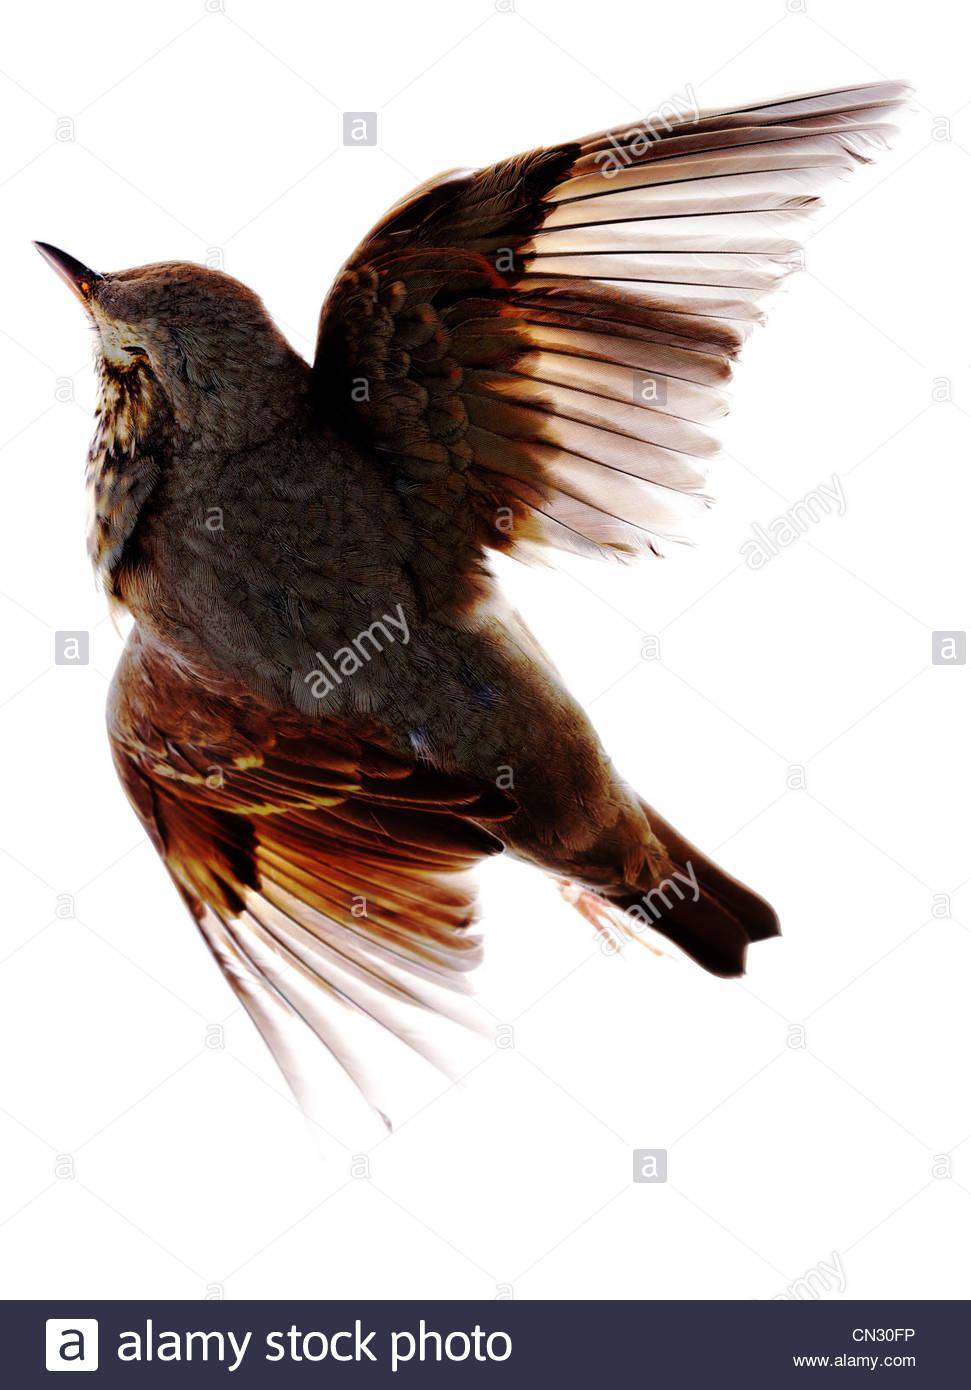 Bird Wing Anatomy Stock Photos & Bird Wing Anatomy Stock Images - Alamy